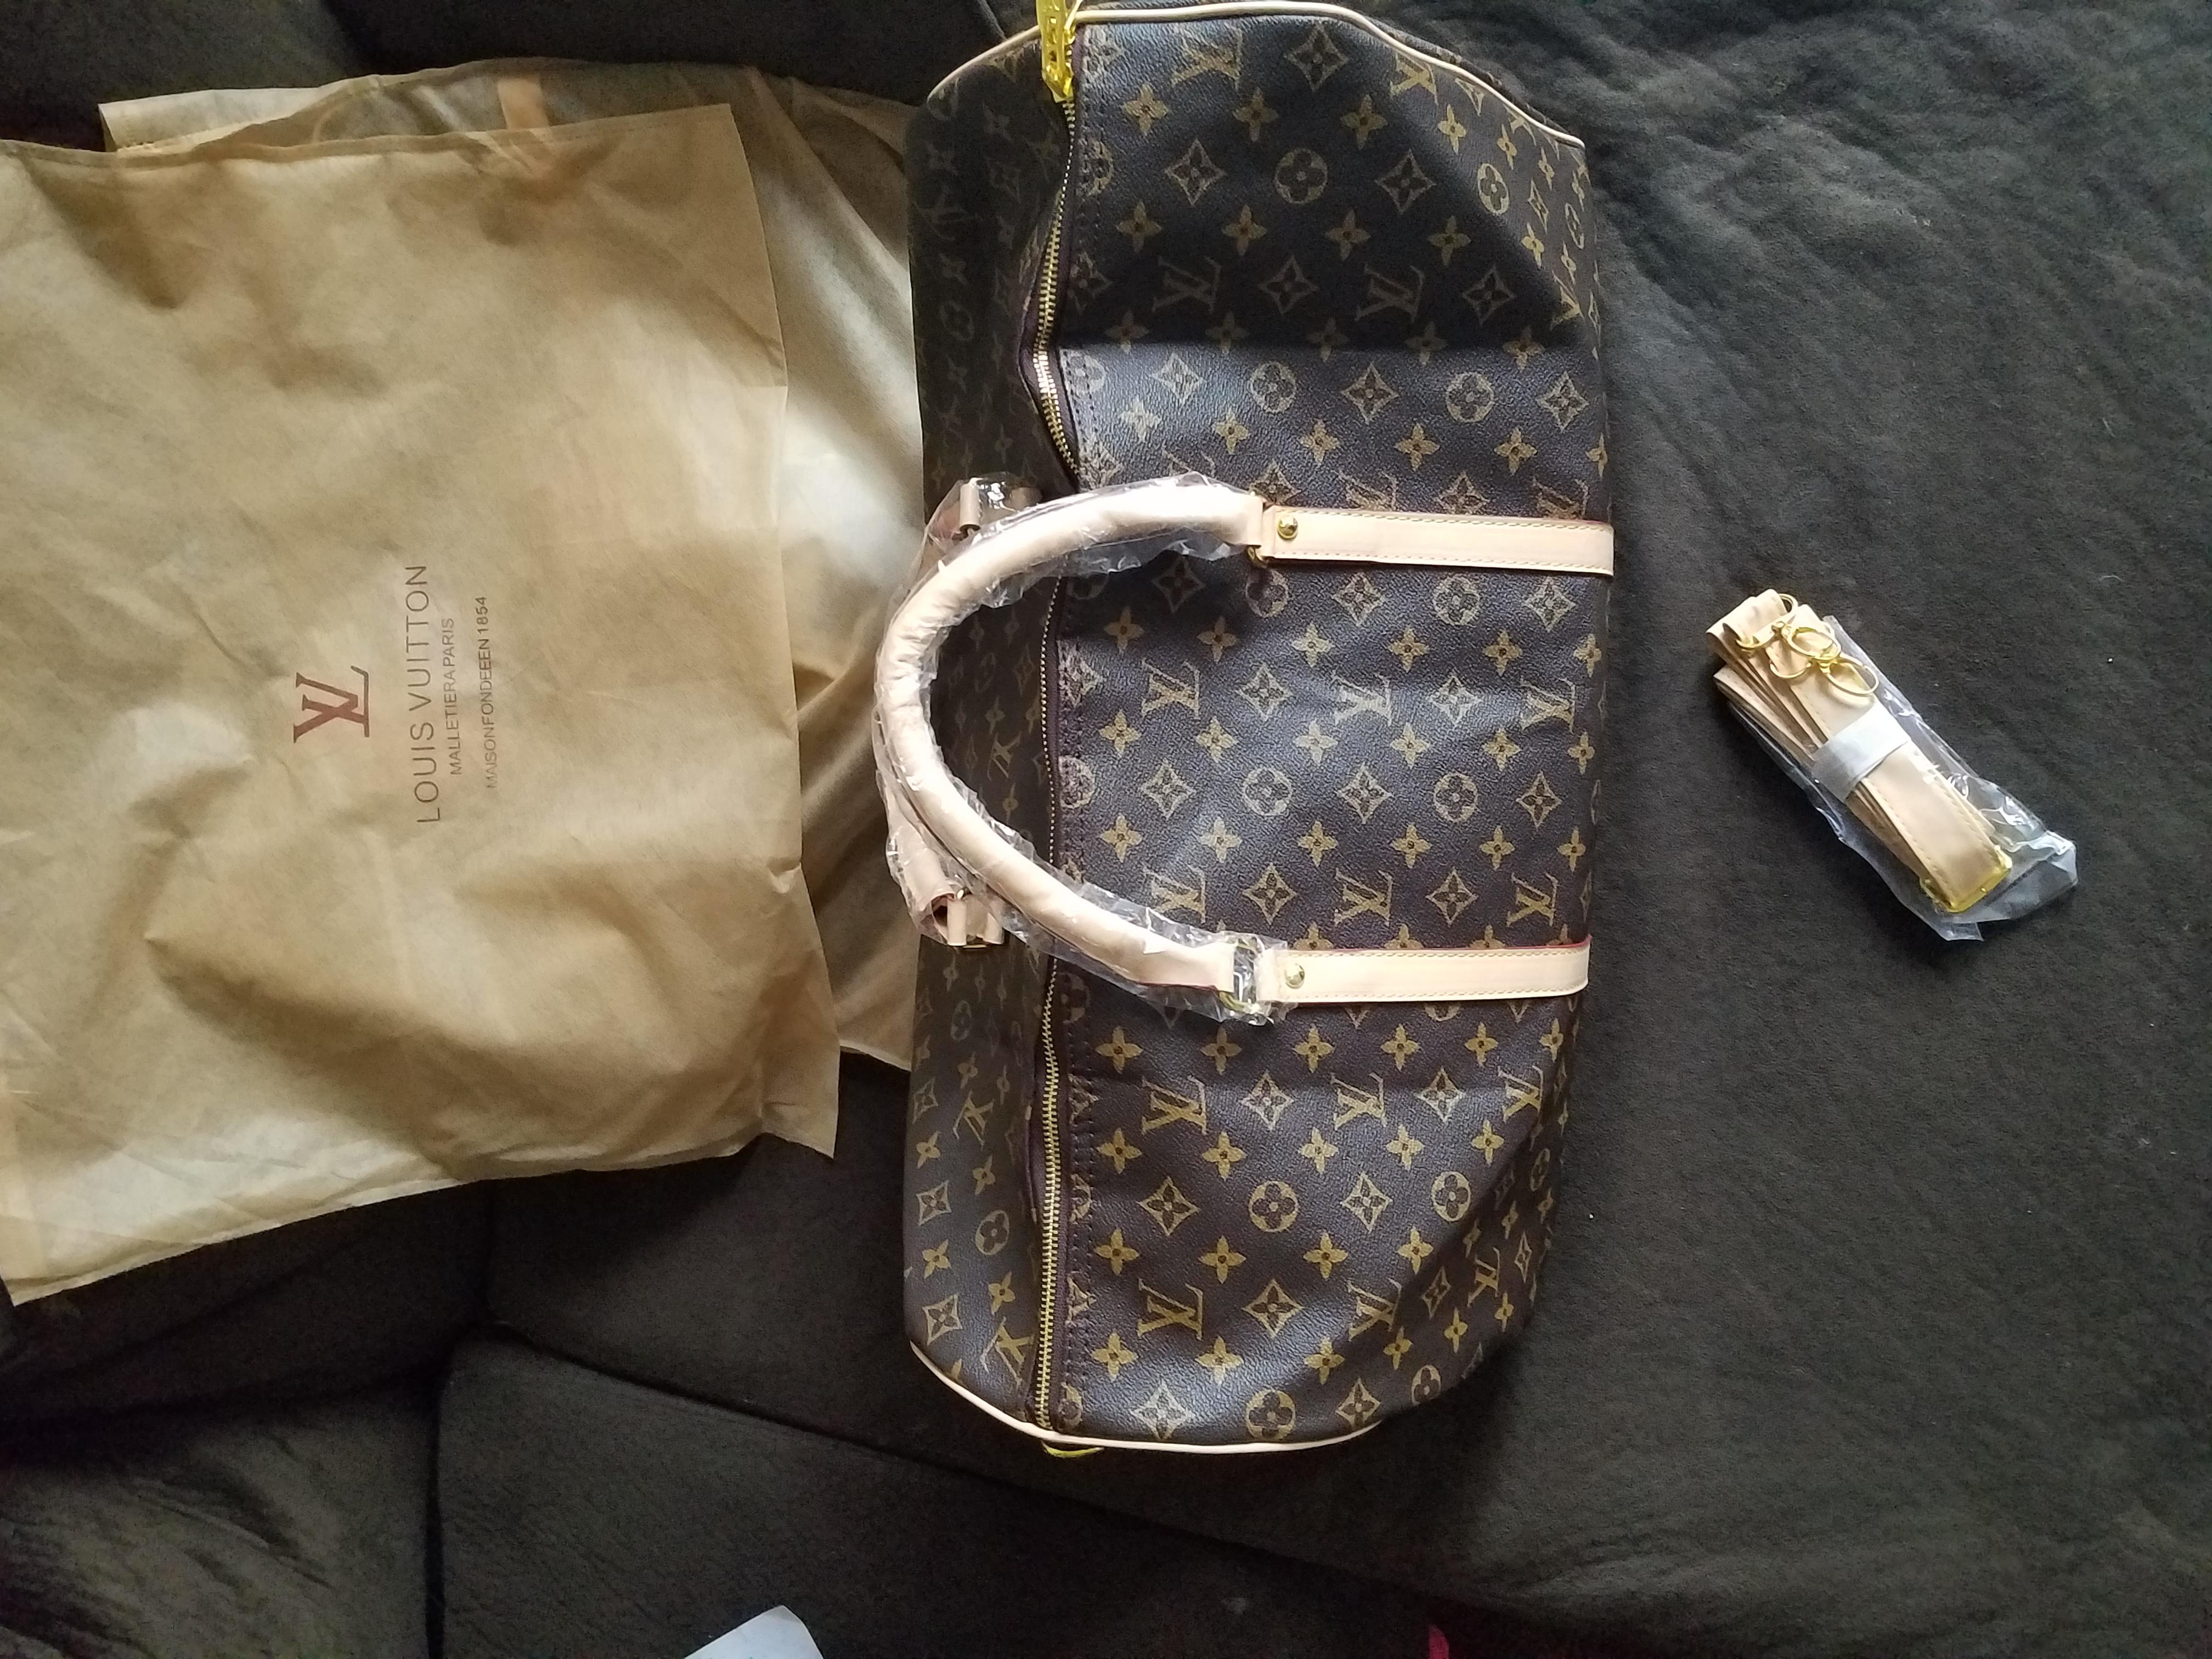 Louis Vuitton BRAND NEW duffle bag